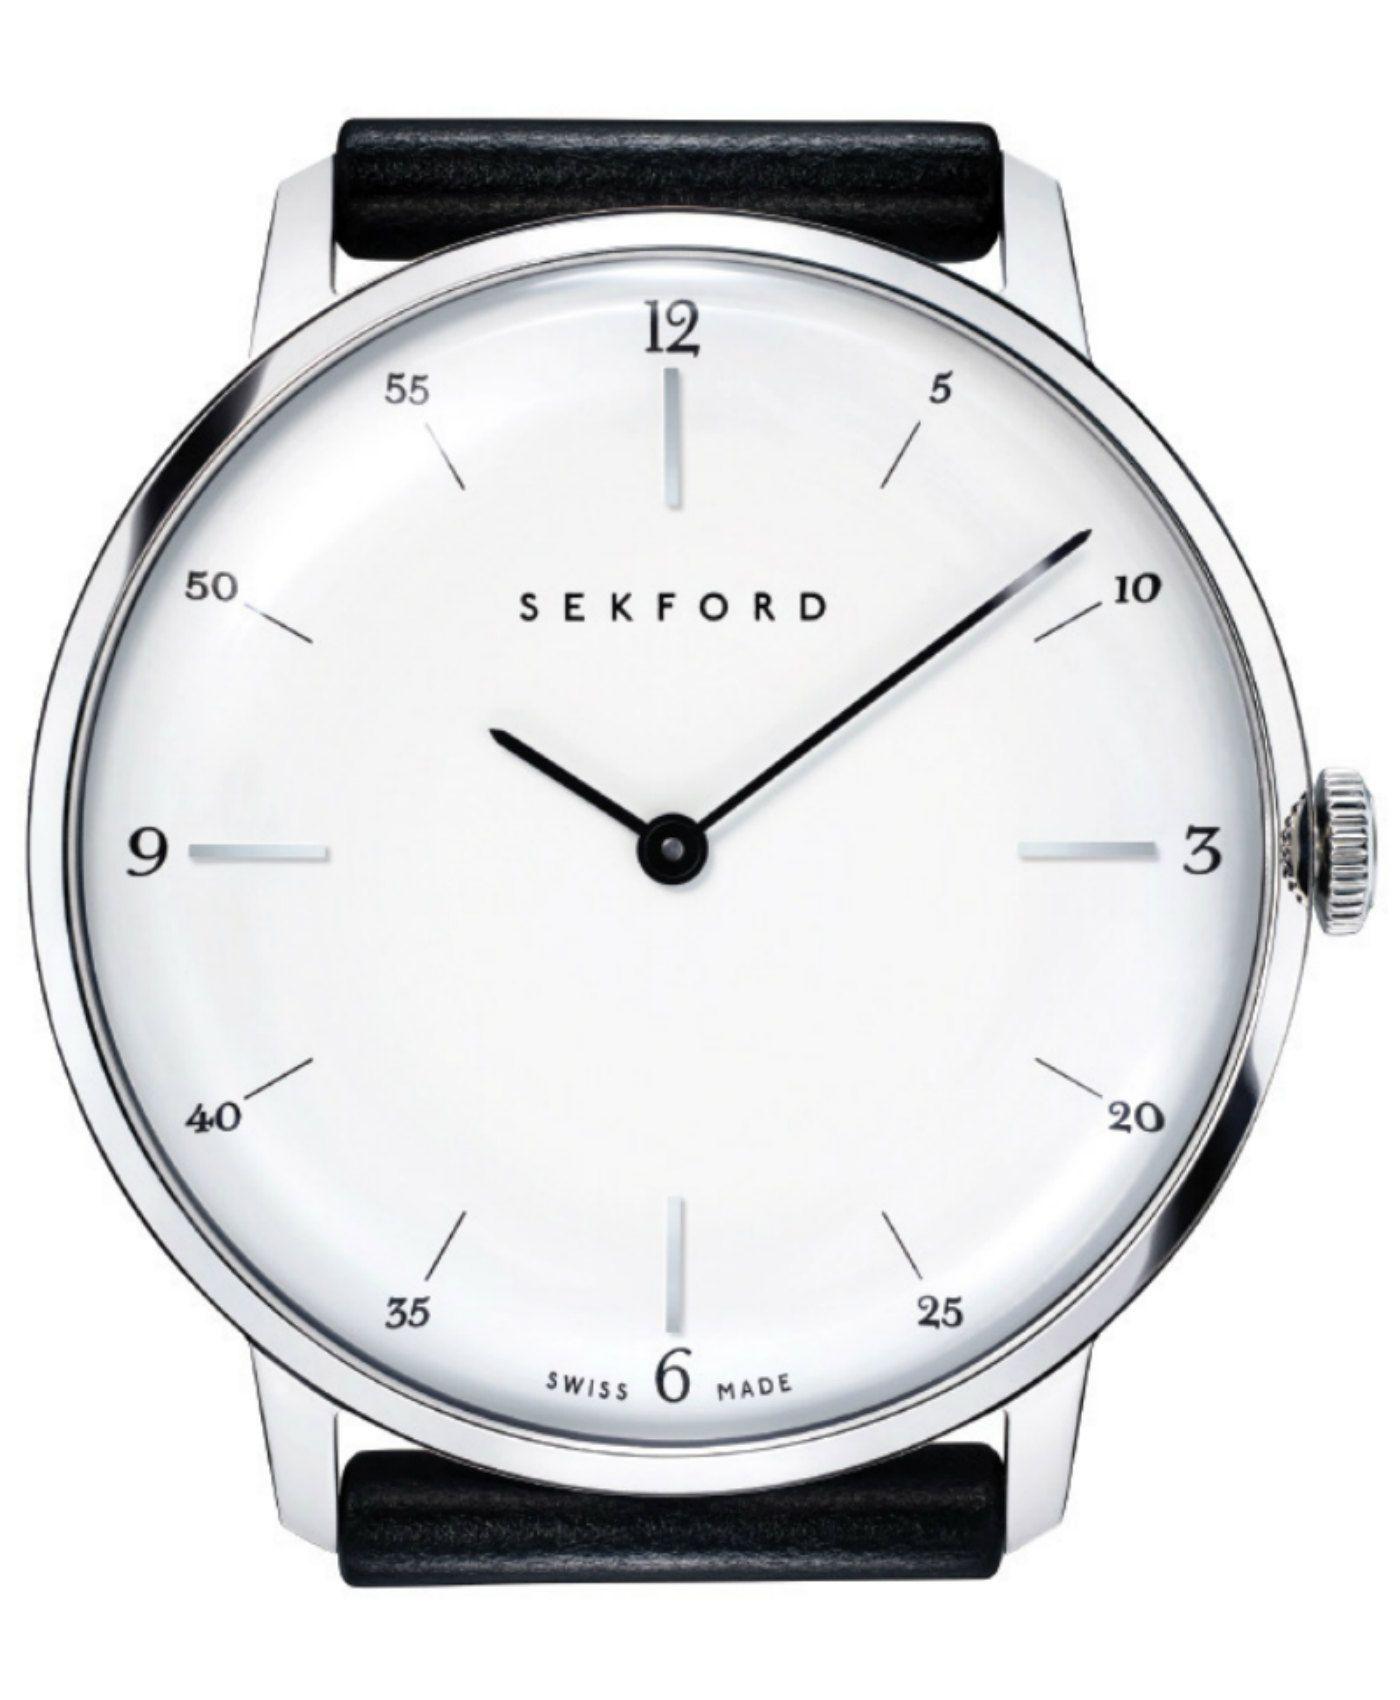 Sekford Type 1a Sek002 Uhr Timex Watches Watches Black